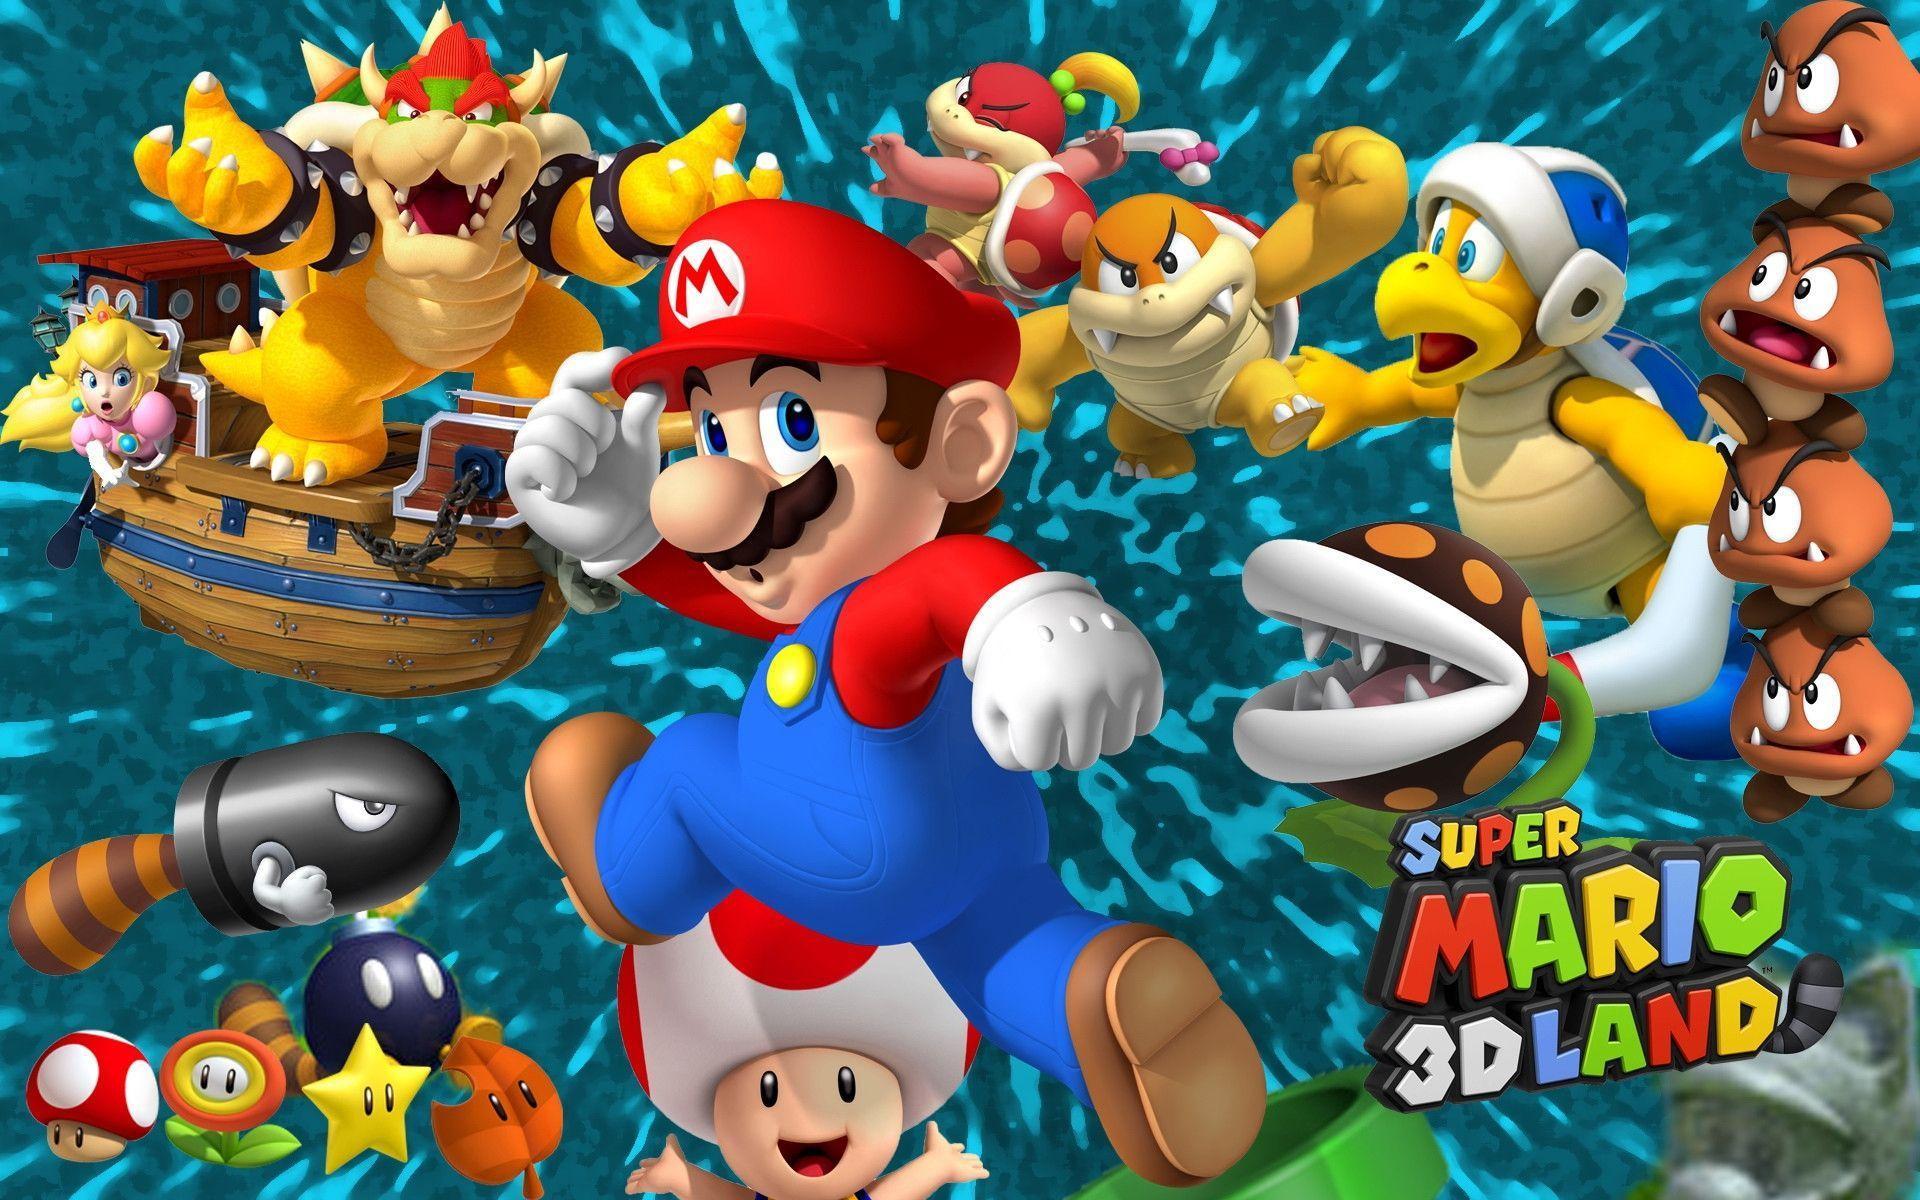 Cool Mario Wallpapers - Wallpaper Cave